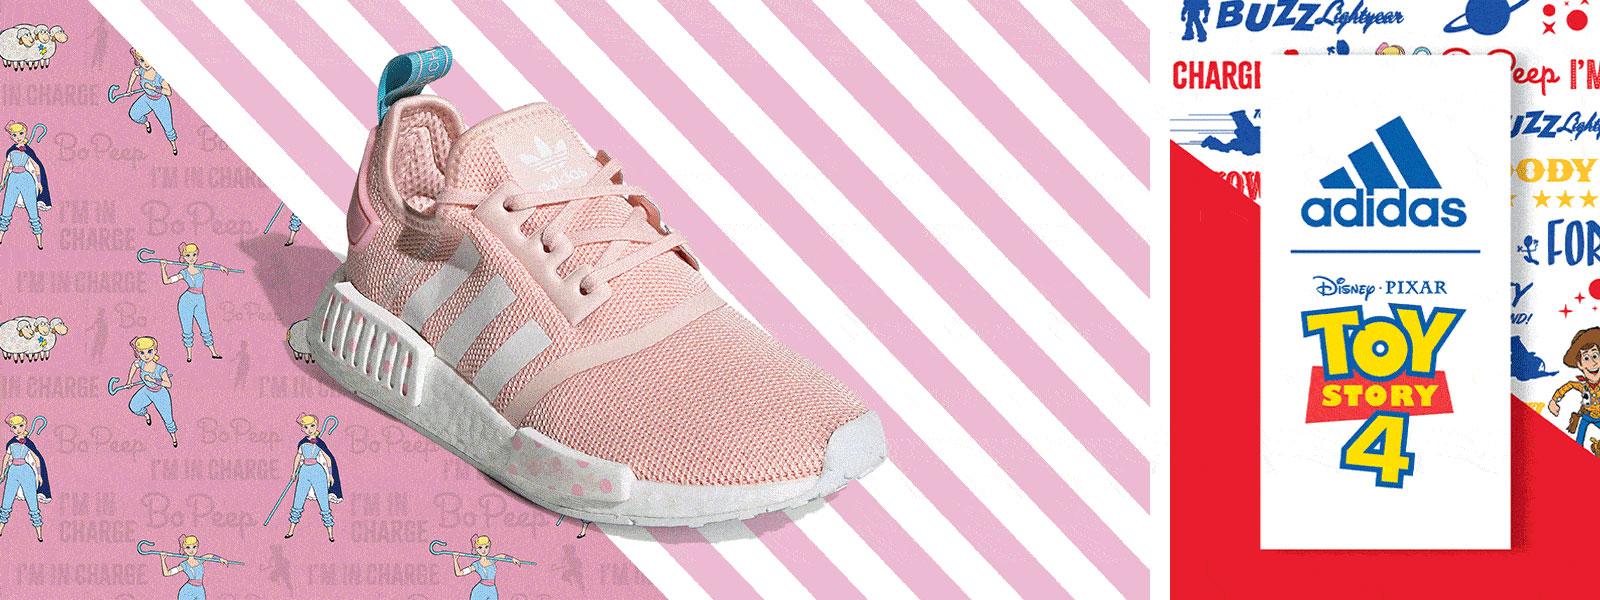 bo-peep-toy-story-4-adidas-nmd-r1-shoe